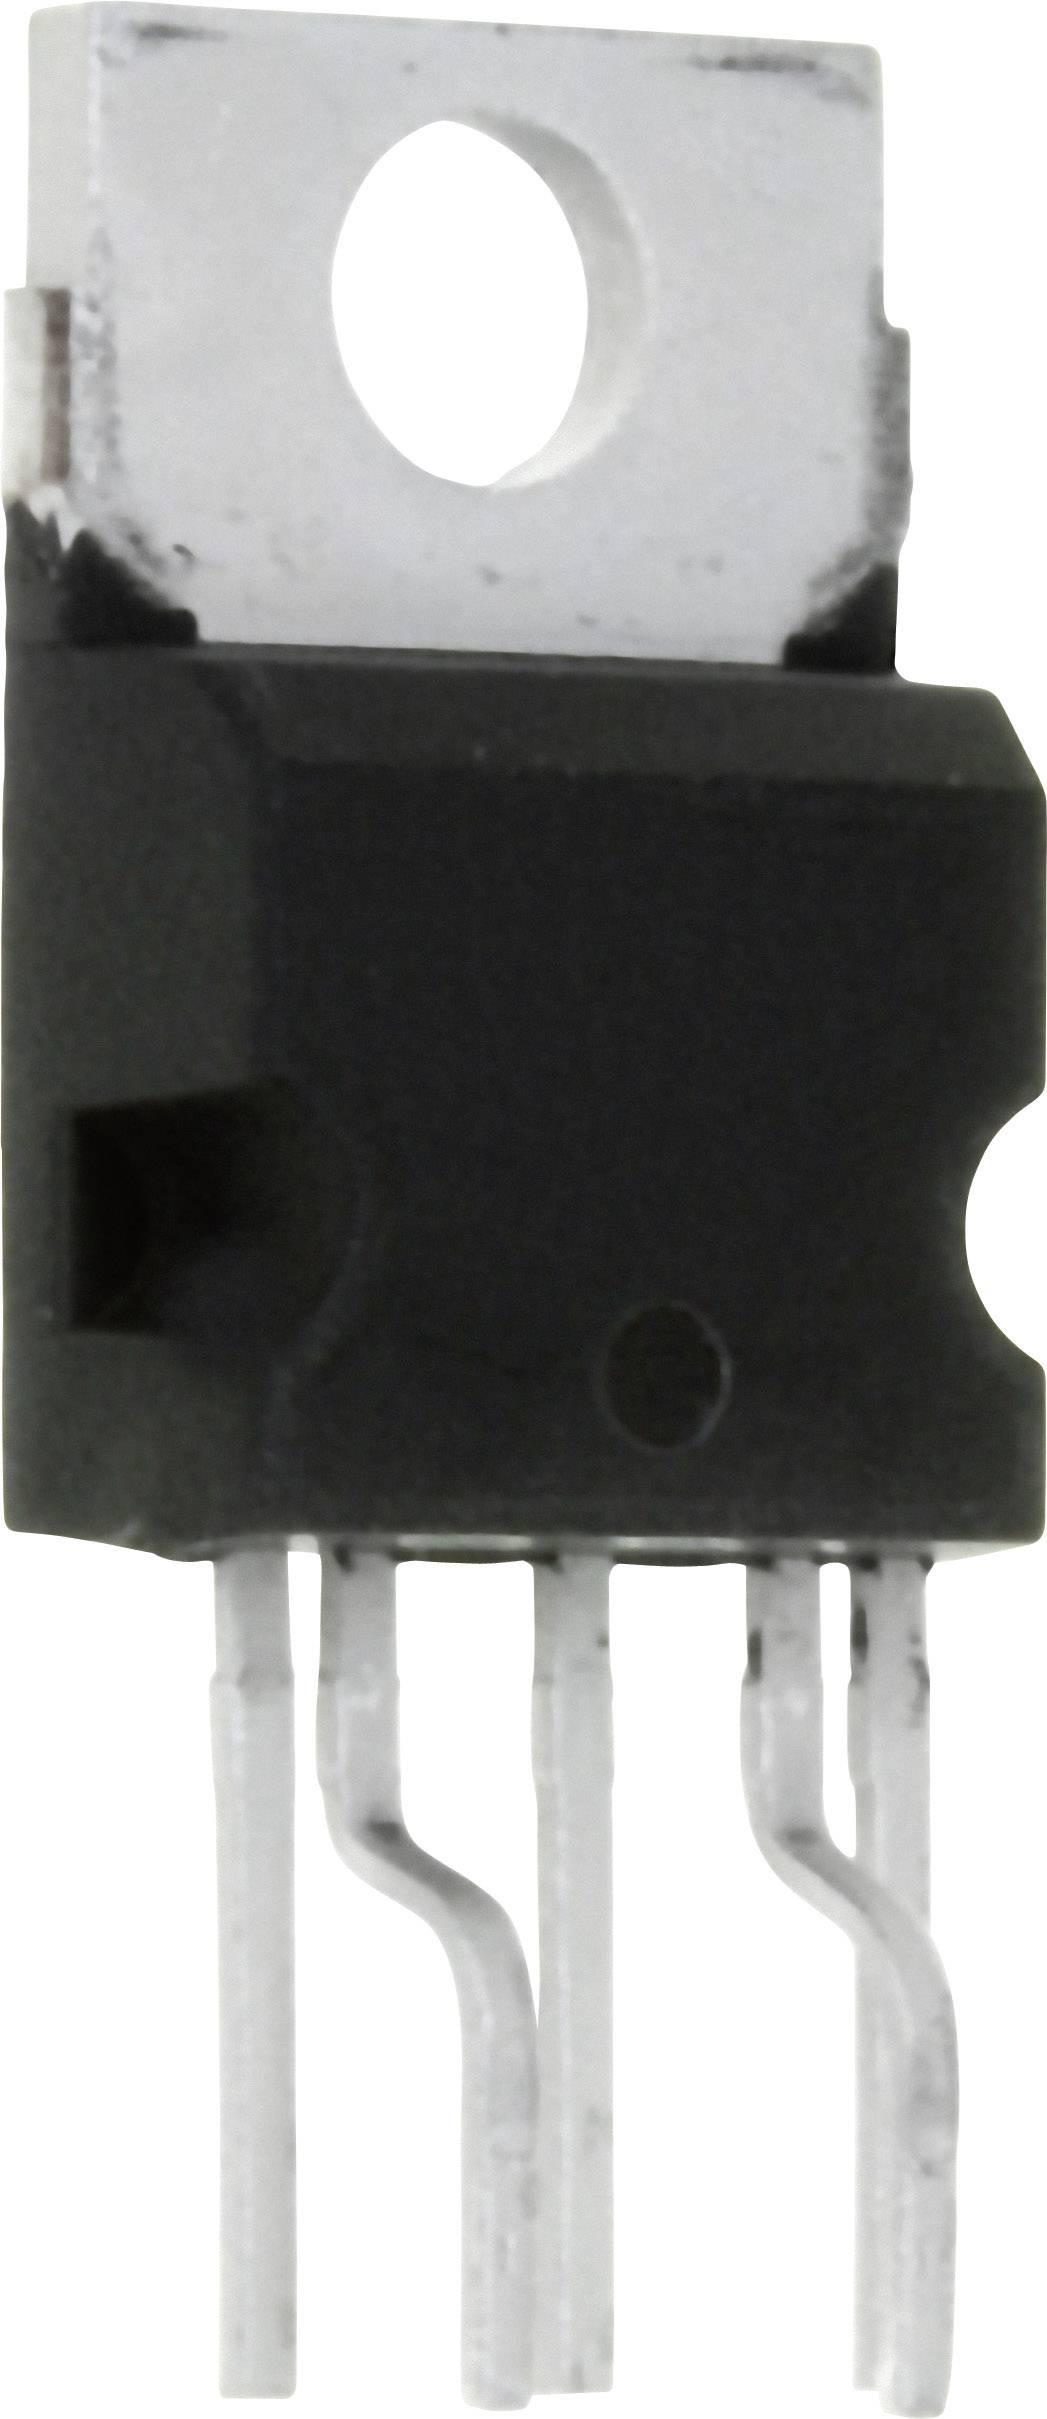 Nastavitelný stabilizátor napětí STMicroelectronics L200CV, 2 A, 2,85 - 36 V, Pentawatt 5